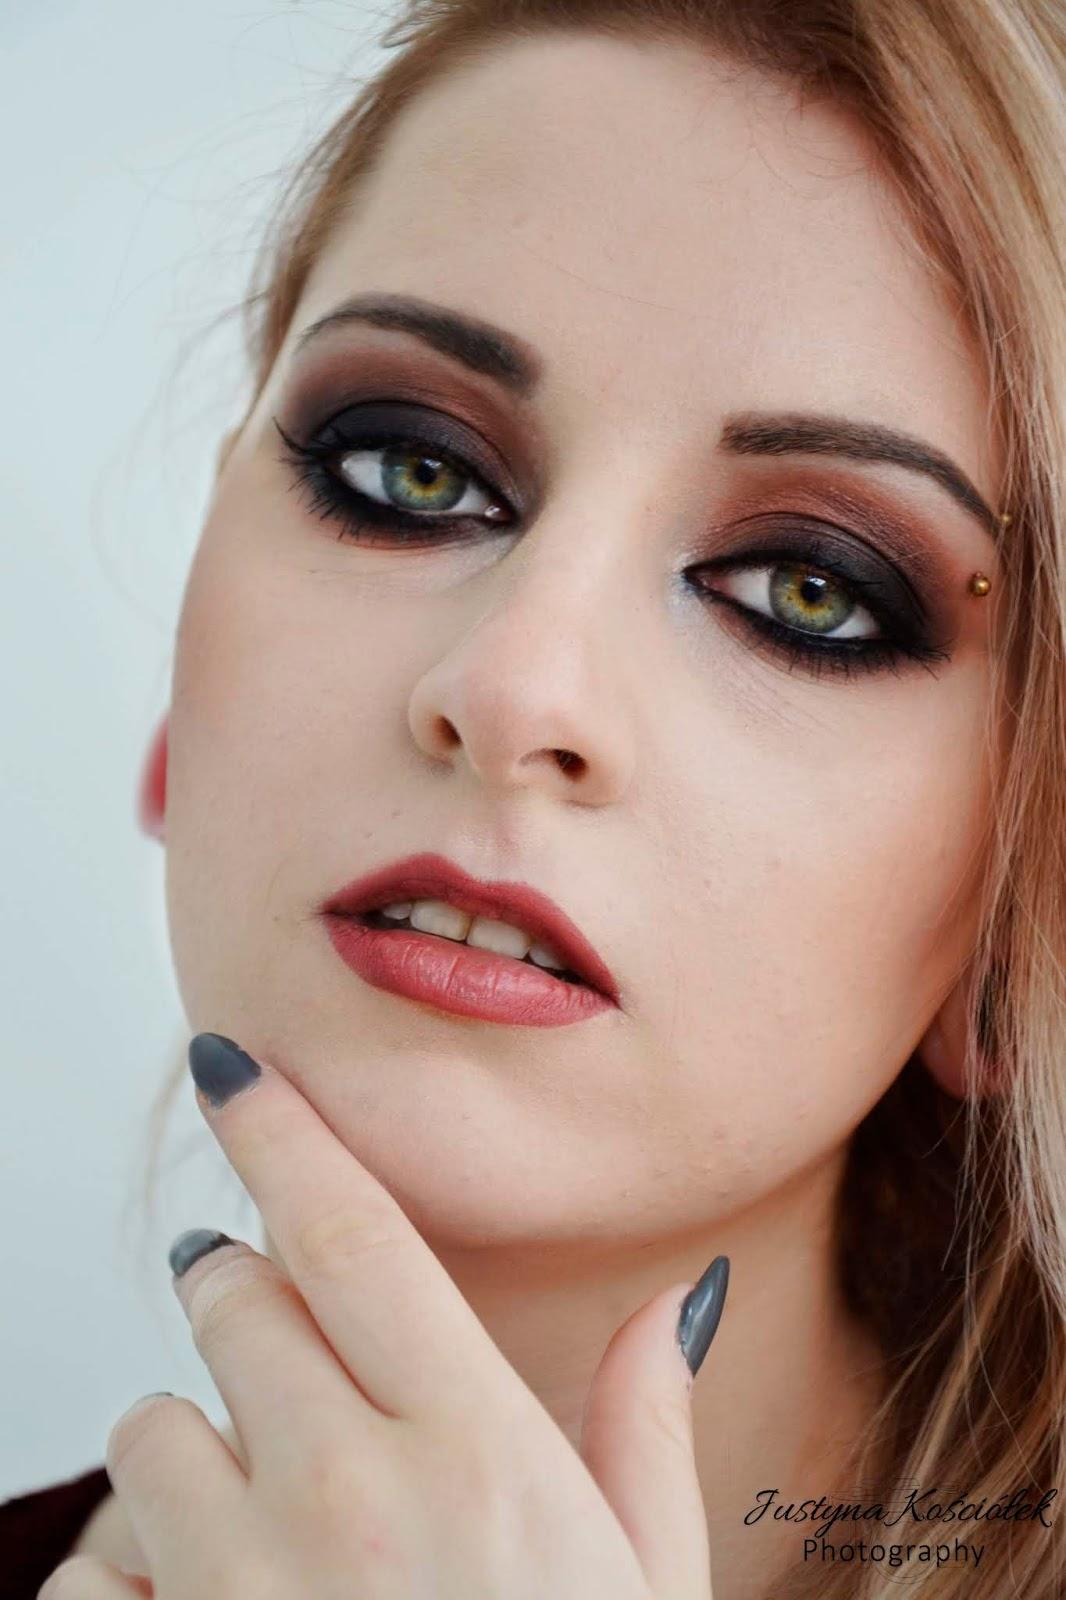 makeup glamour mac, nyx, makeup revolution, kobo, Dior, Kryolan, Rimmel, Catrice, Bell, Karaya, Revlon, Zoeva